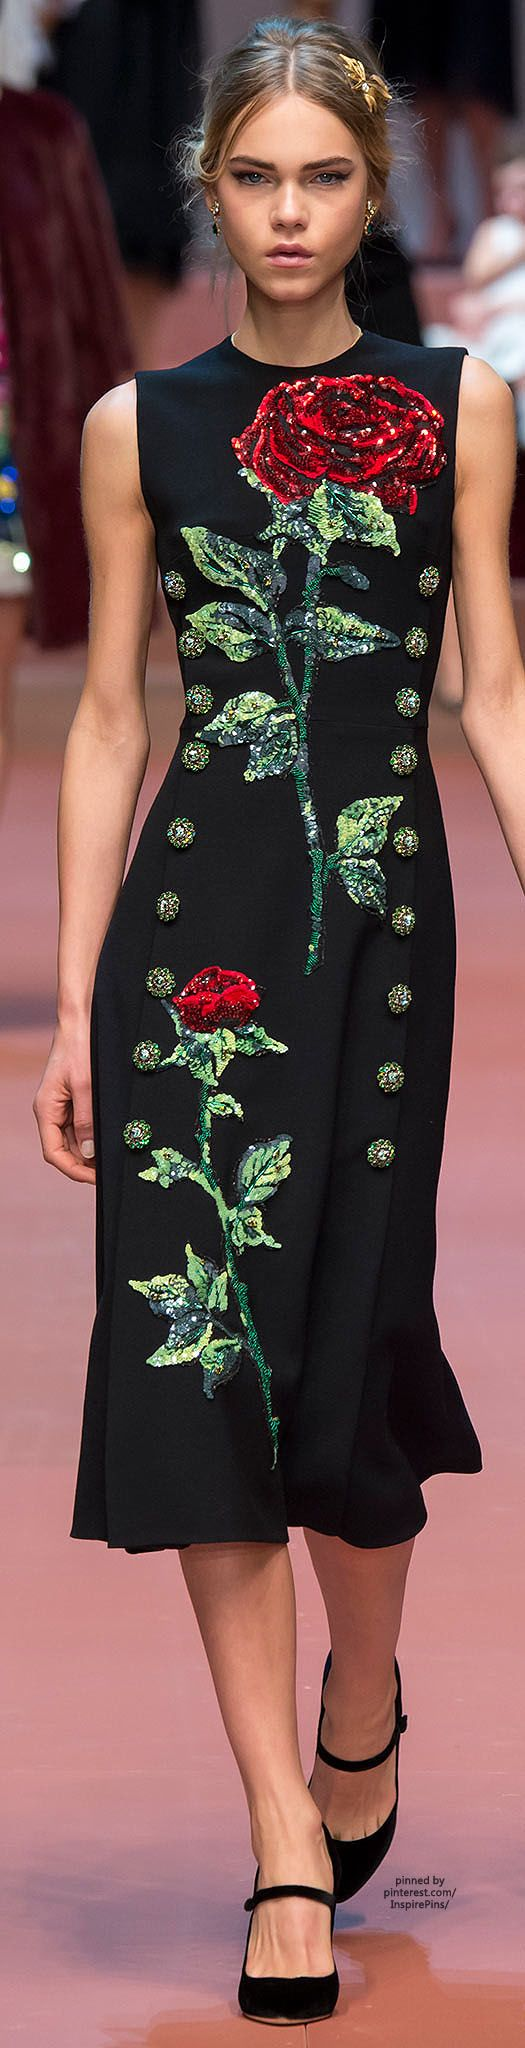 Dolce & Gabbana FW2015 | Purely Inspiration